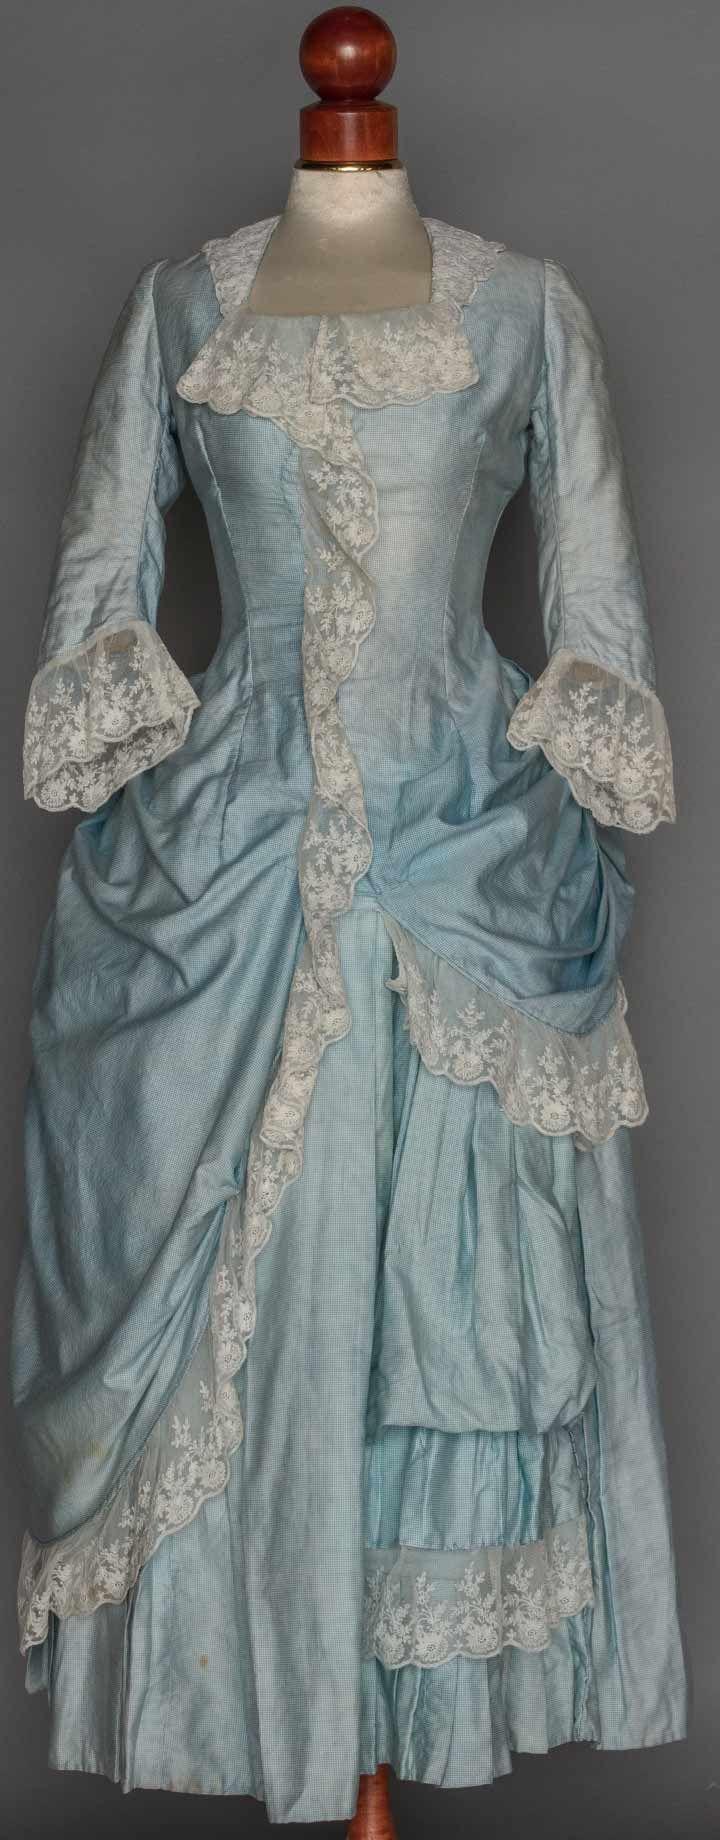 "1-piece navy silk satin, bodice & bustle skirt trimmed w/ navy & copper striped ribbon, B 32"", W 23"", L 35""-37"", excellent; 1 2-piece pale blue gingham, a-symmetric polonaise skirt, trimmed w/ lace flounces, B 34"", W 27"", Skirt L 49"", (stains, faded)fair."